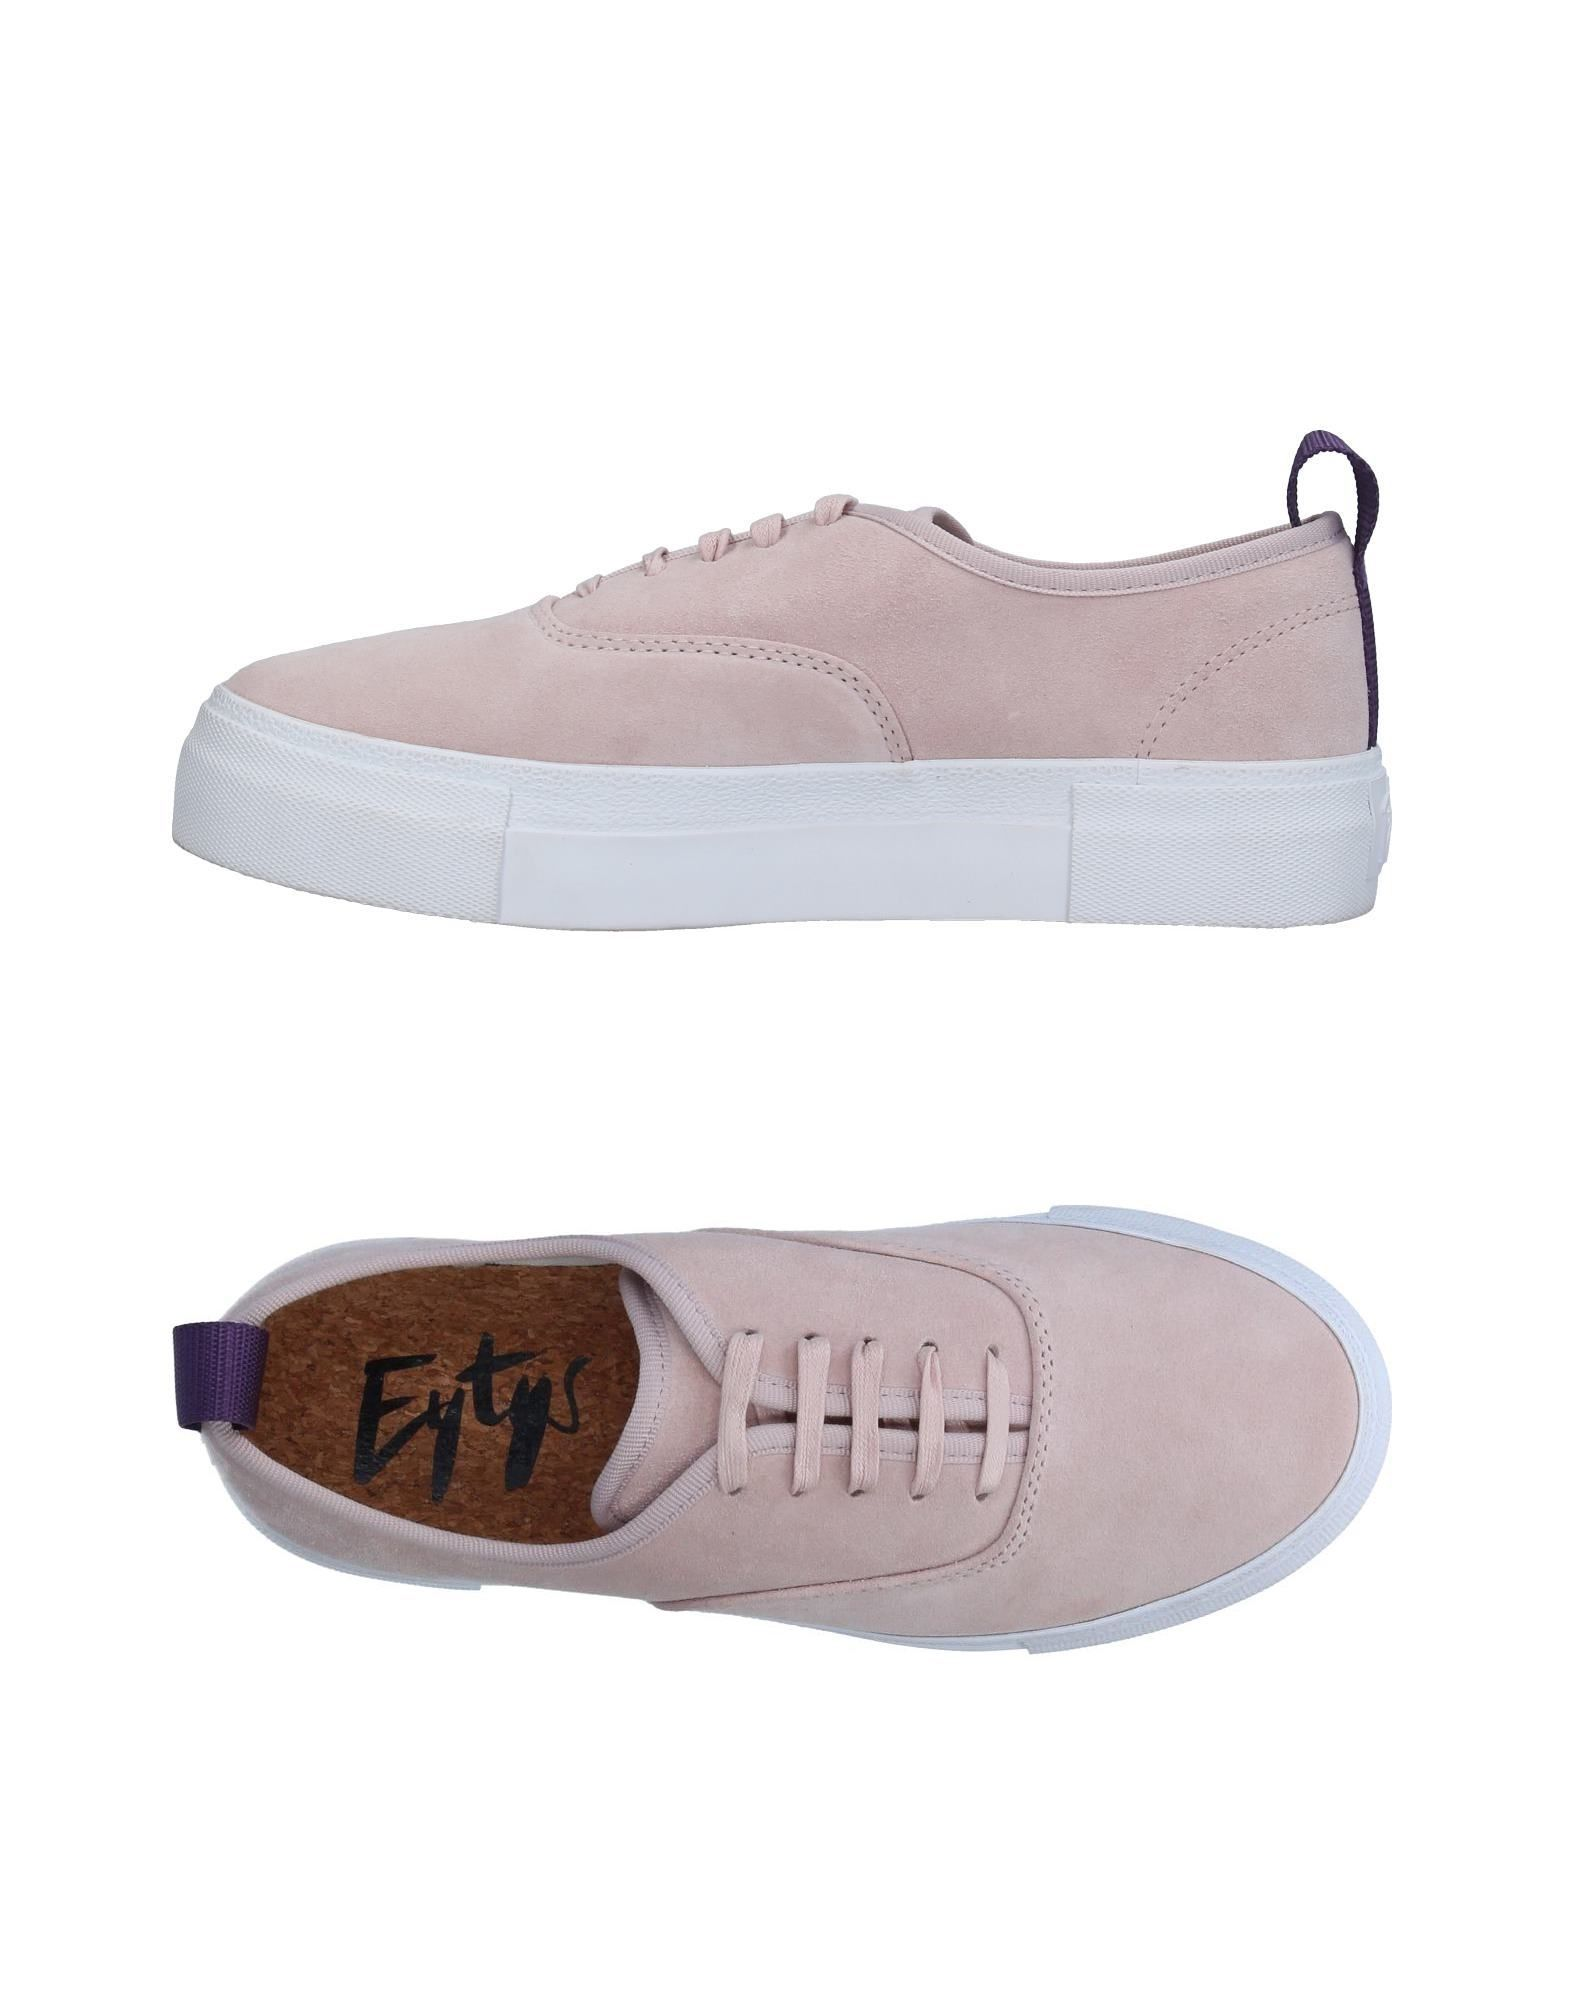 Eytys Sneakers - - - Women Eytys Sneakers online on  United Kingdom - 11337784VJ d314ce